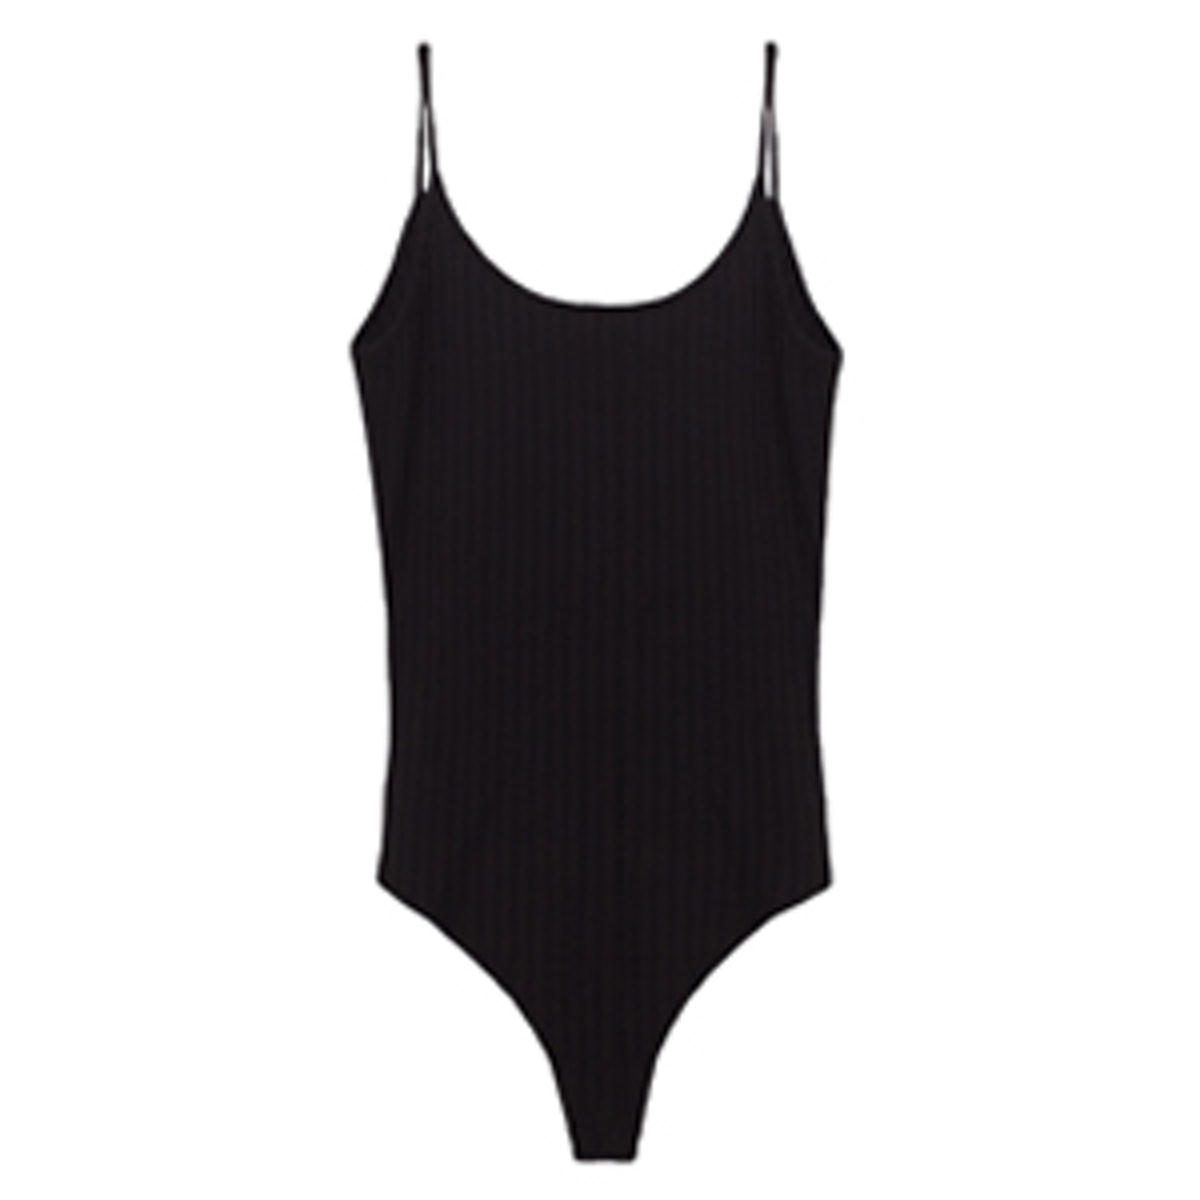 Bodysuit With Low Cut Back